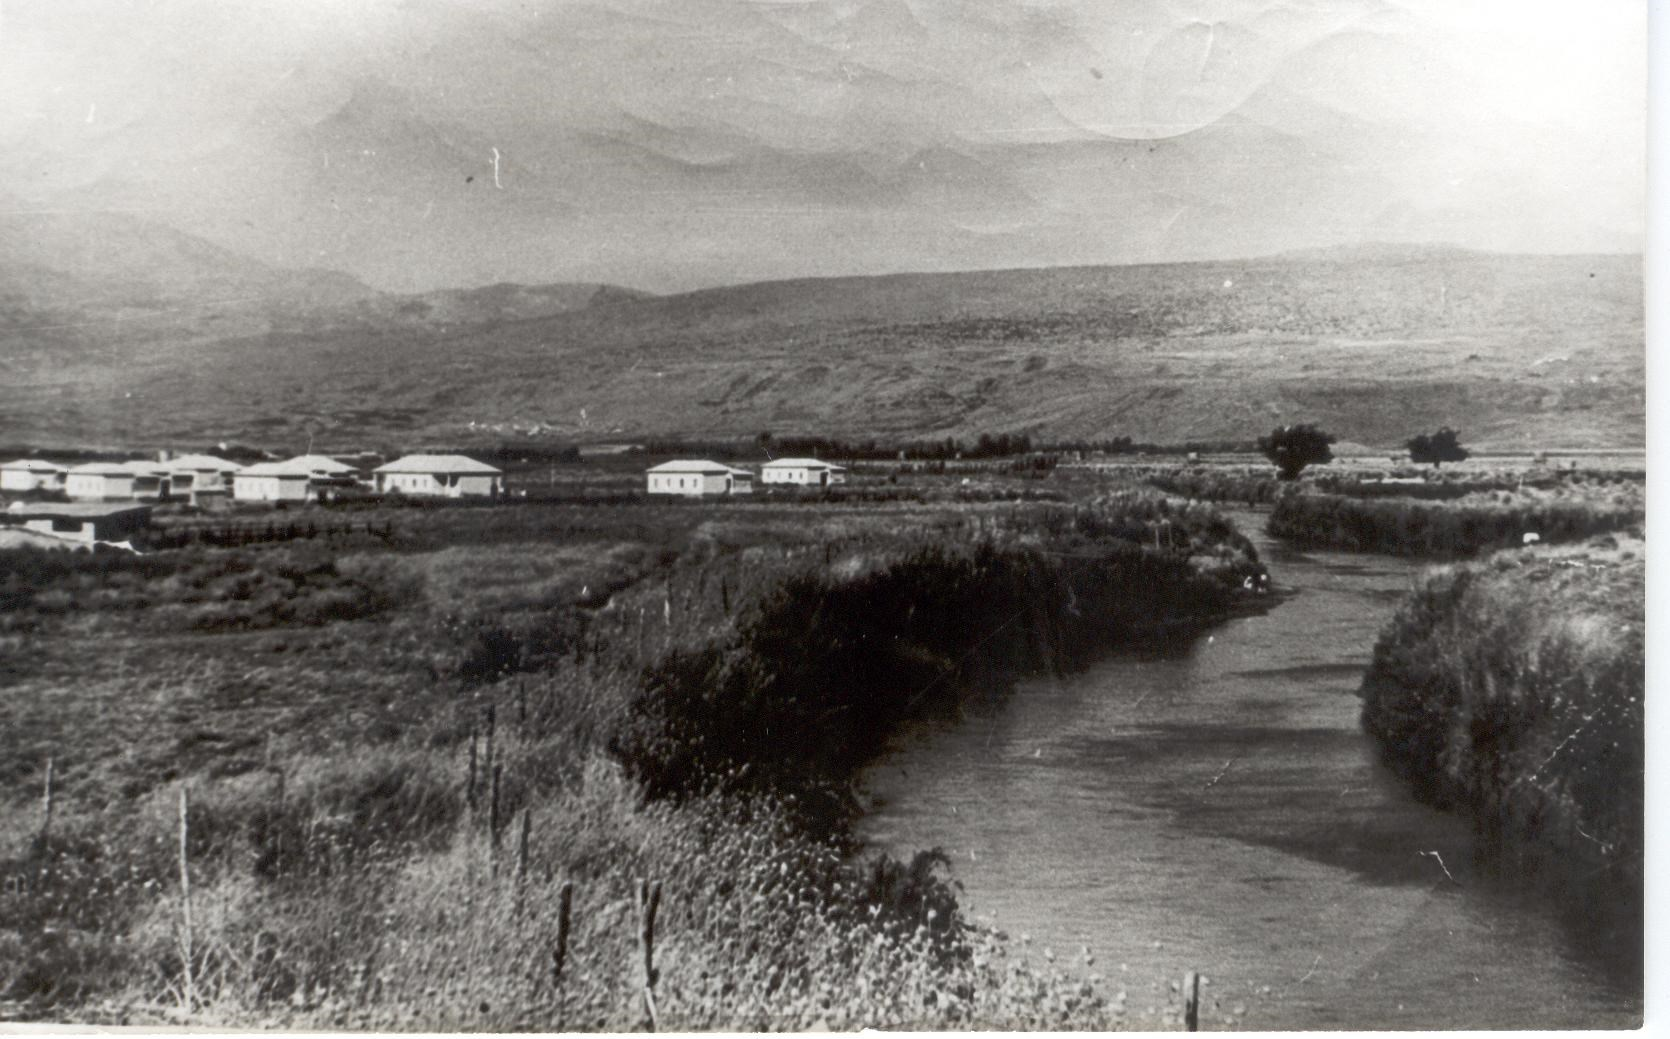 kibbutz-kfar-blum-